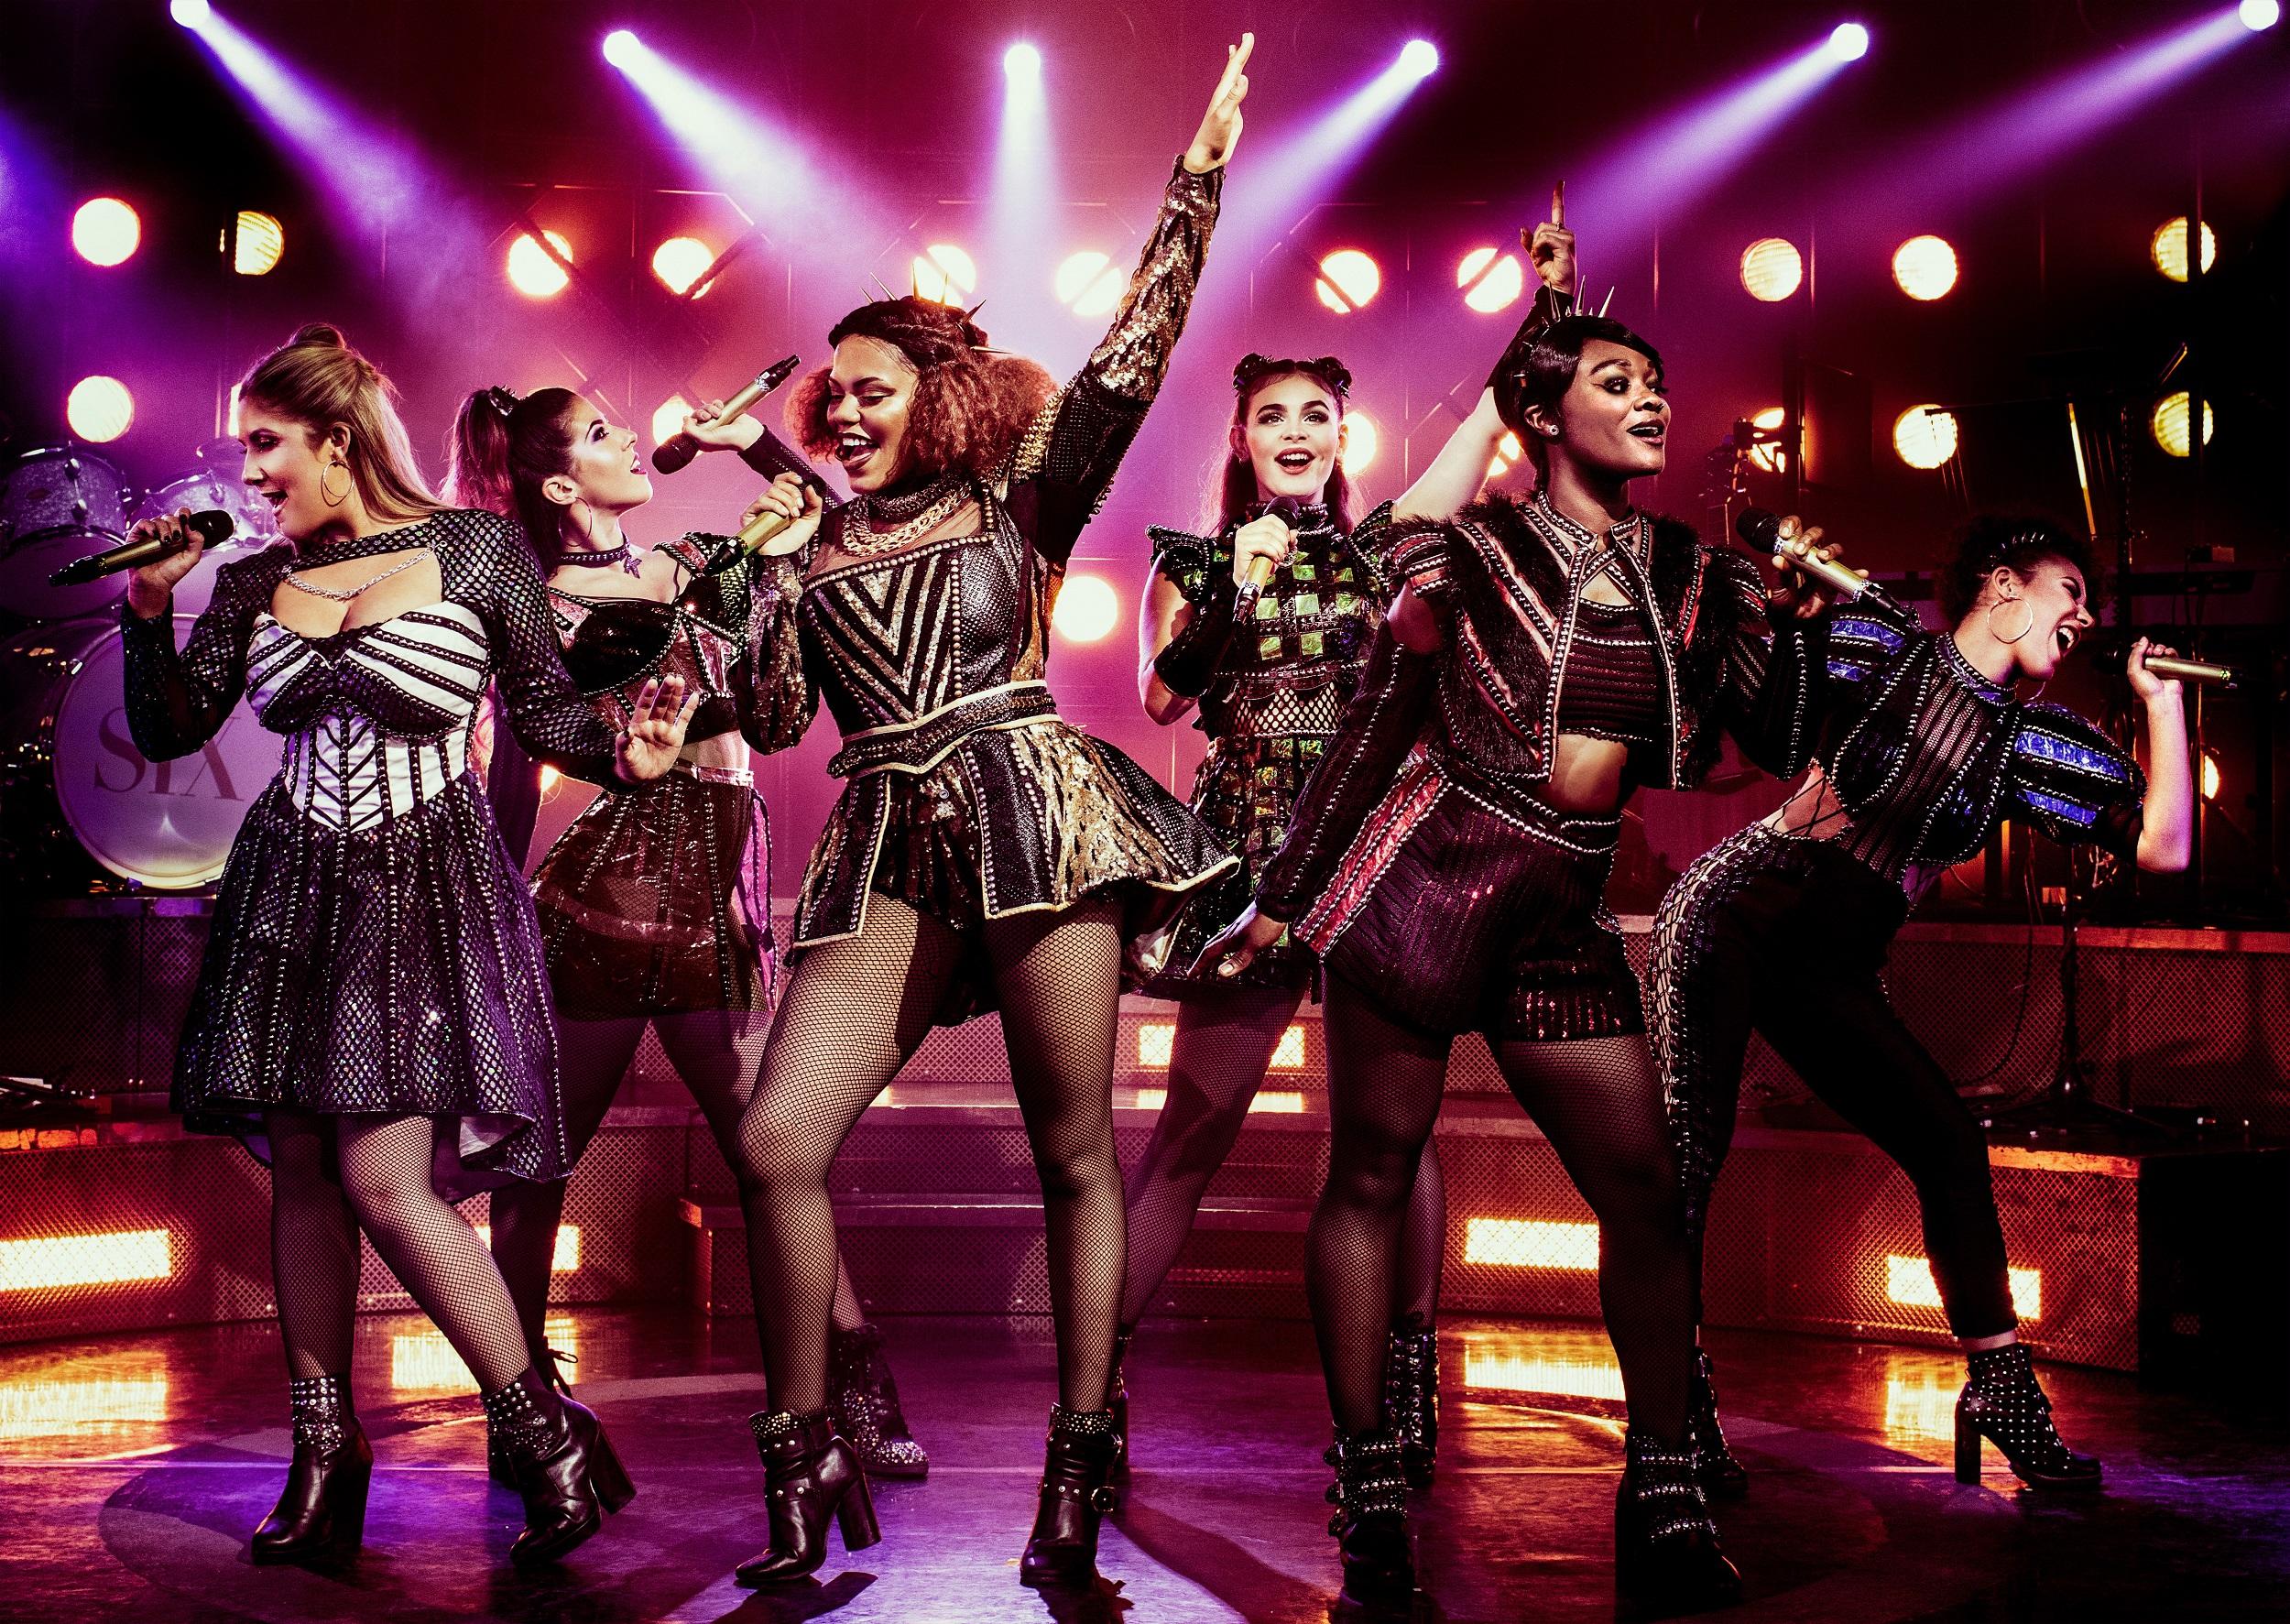 Norwegian Cruise Line enhances entertainment quotient with British